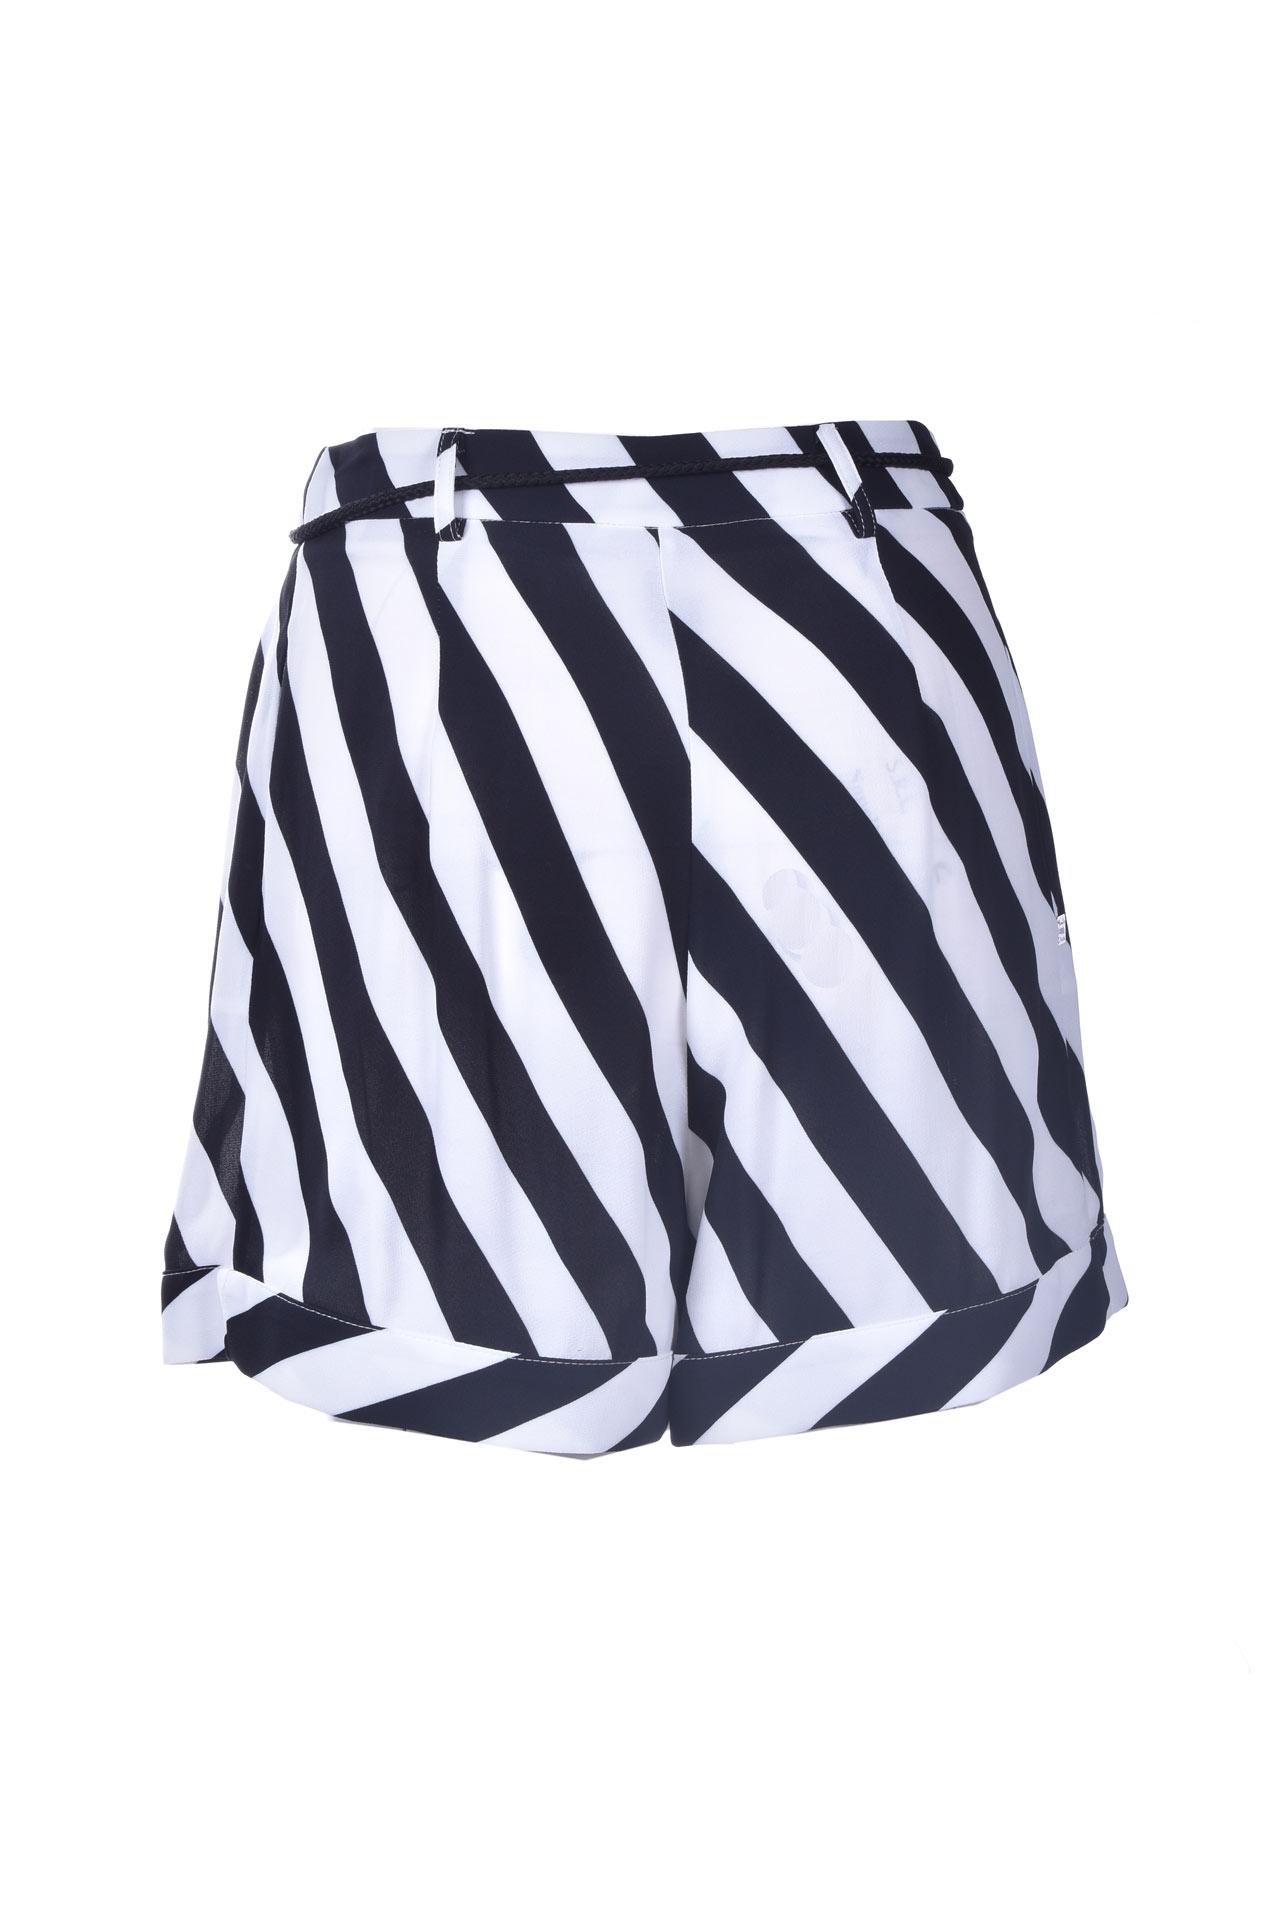 Shorts morbido a righe bianche e nere MANILA GRACE   Shorts   P039VIMA028